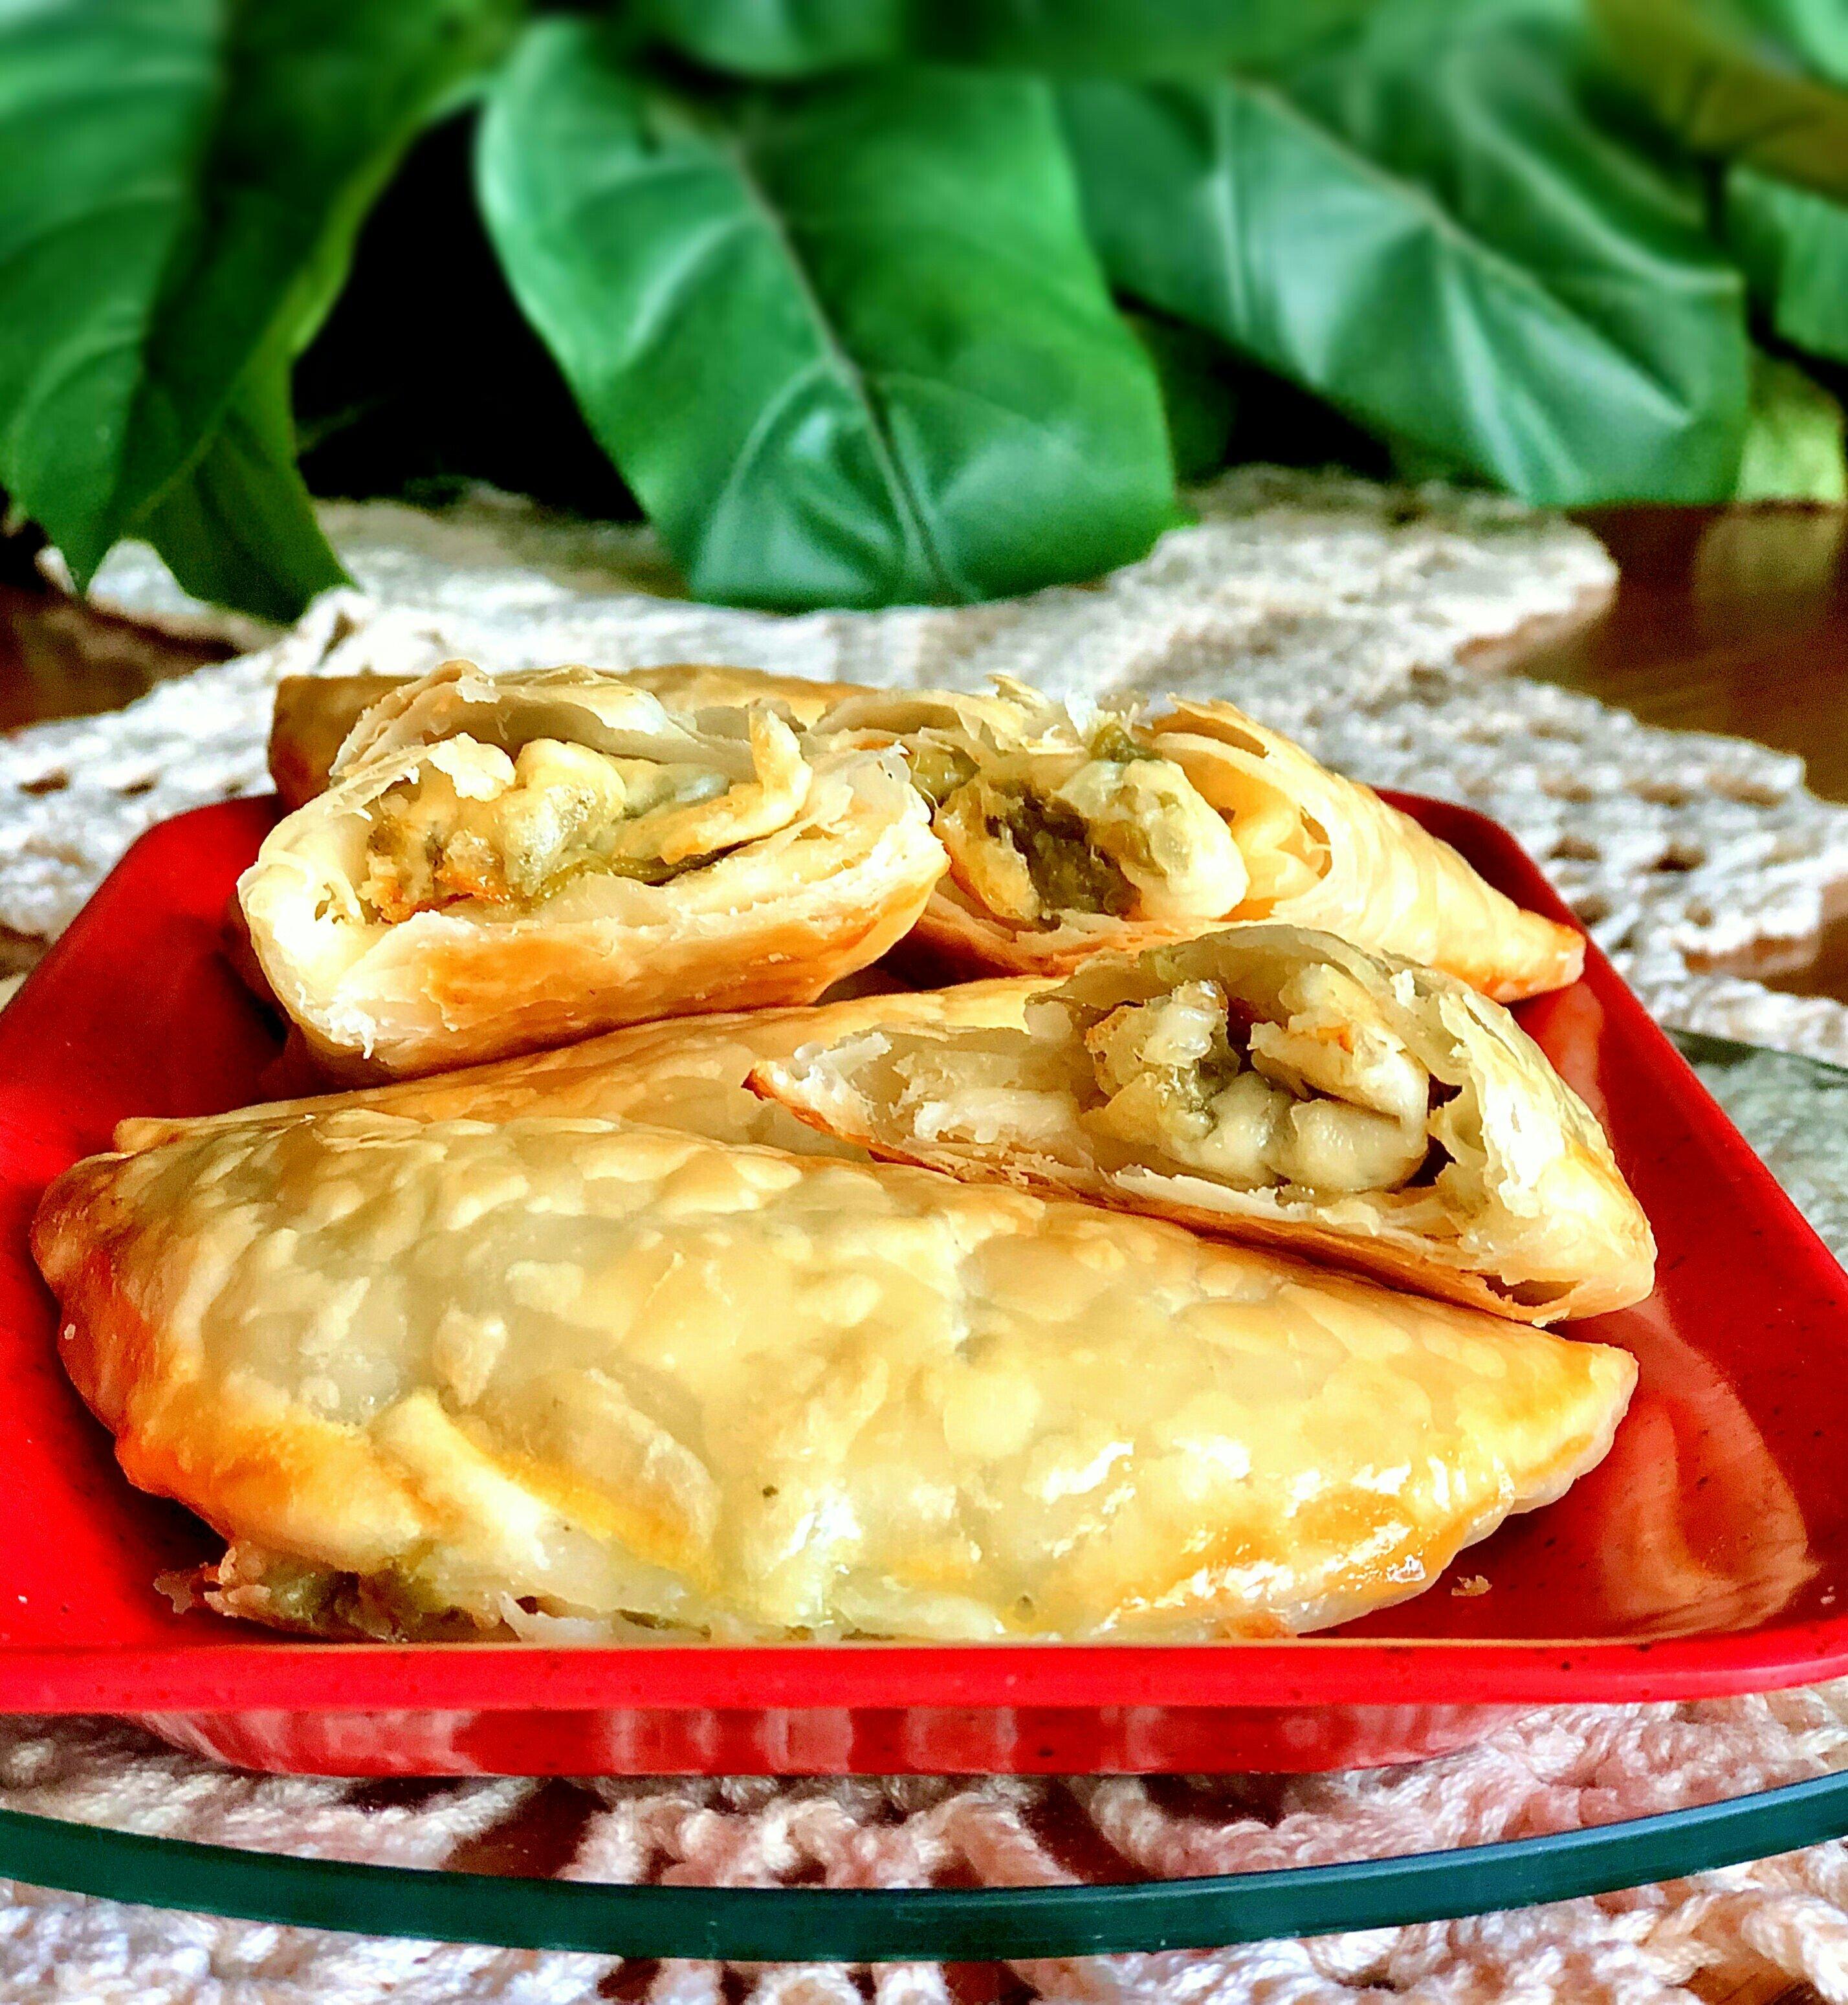 empanadas de queso con rajas poblano chile and cheese